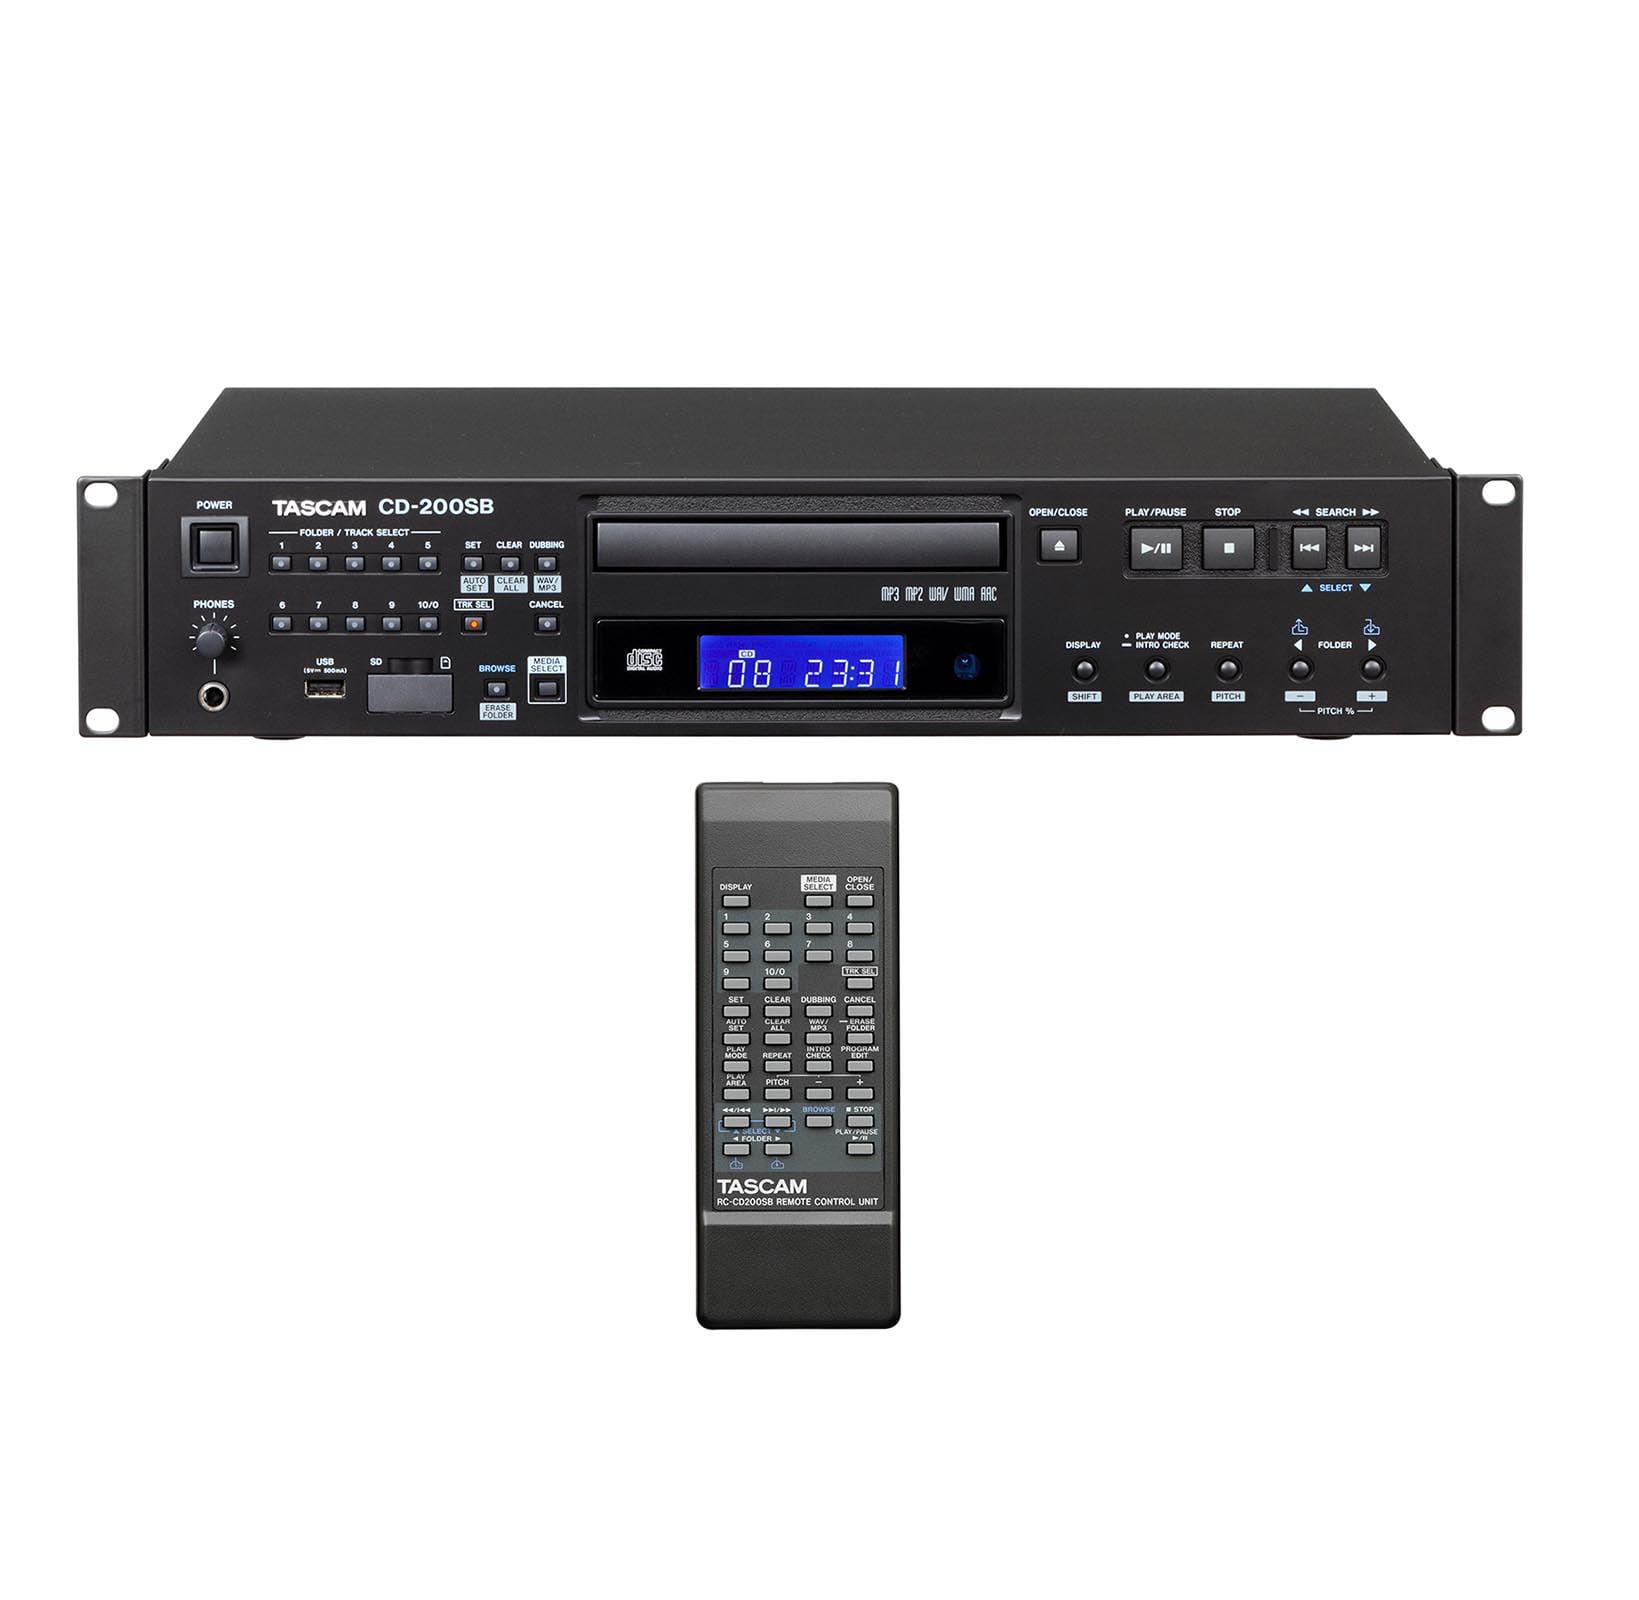 TASCAM CD-200SB Single SD SDHC, USB & CD Professional 2U Rackmountable Player by Tascam